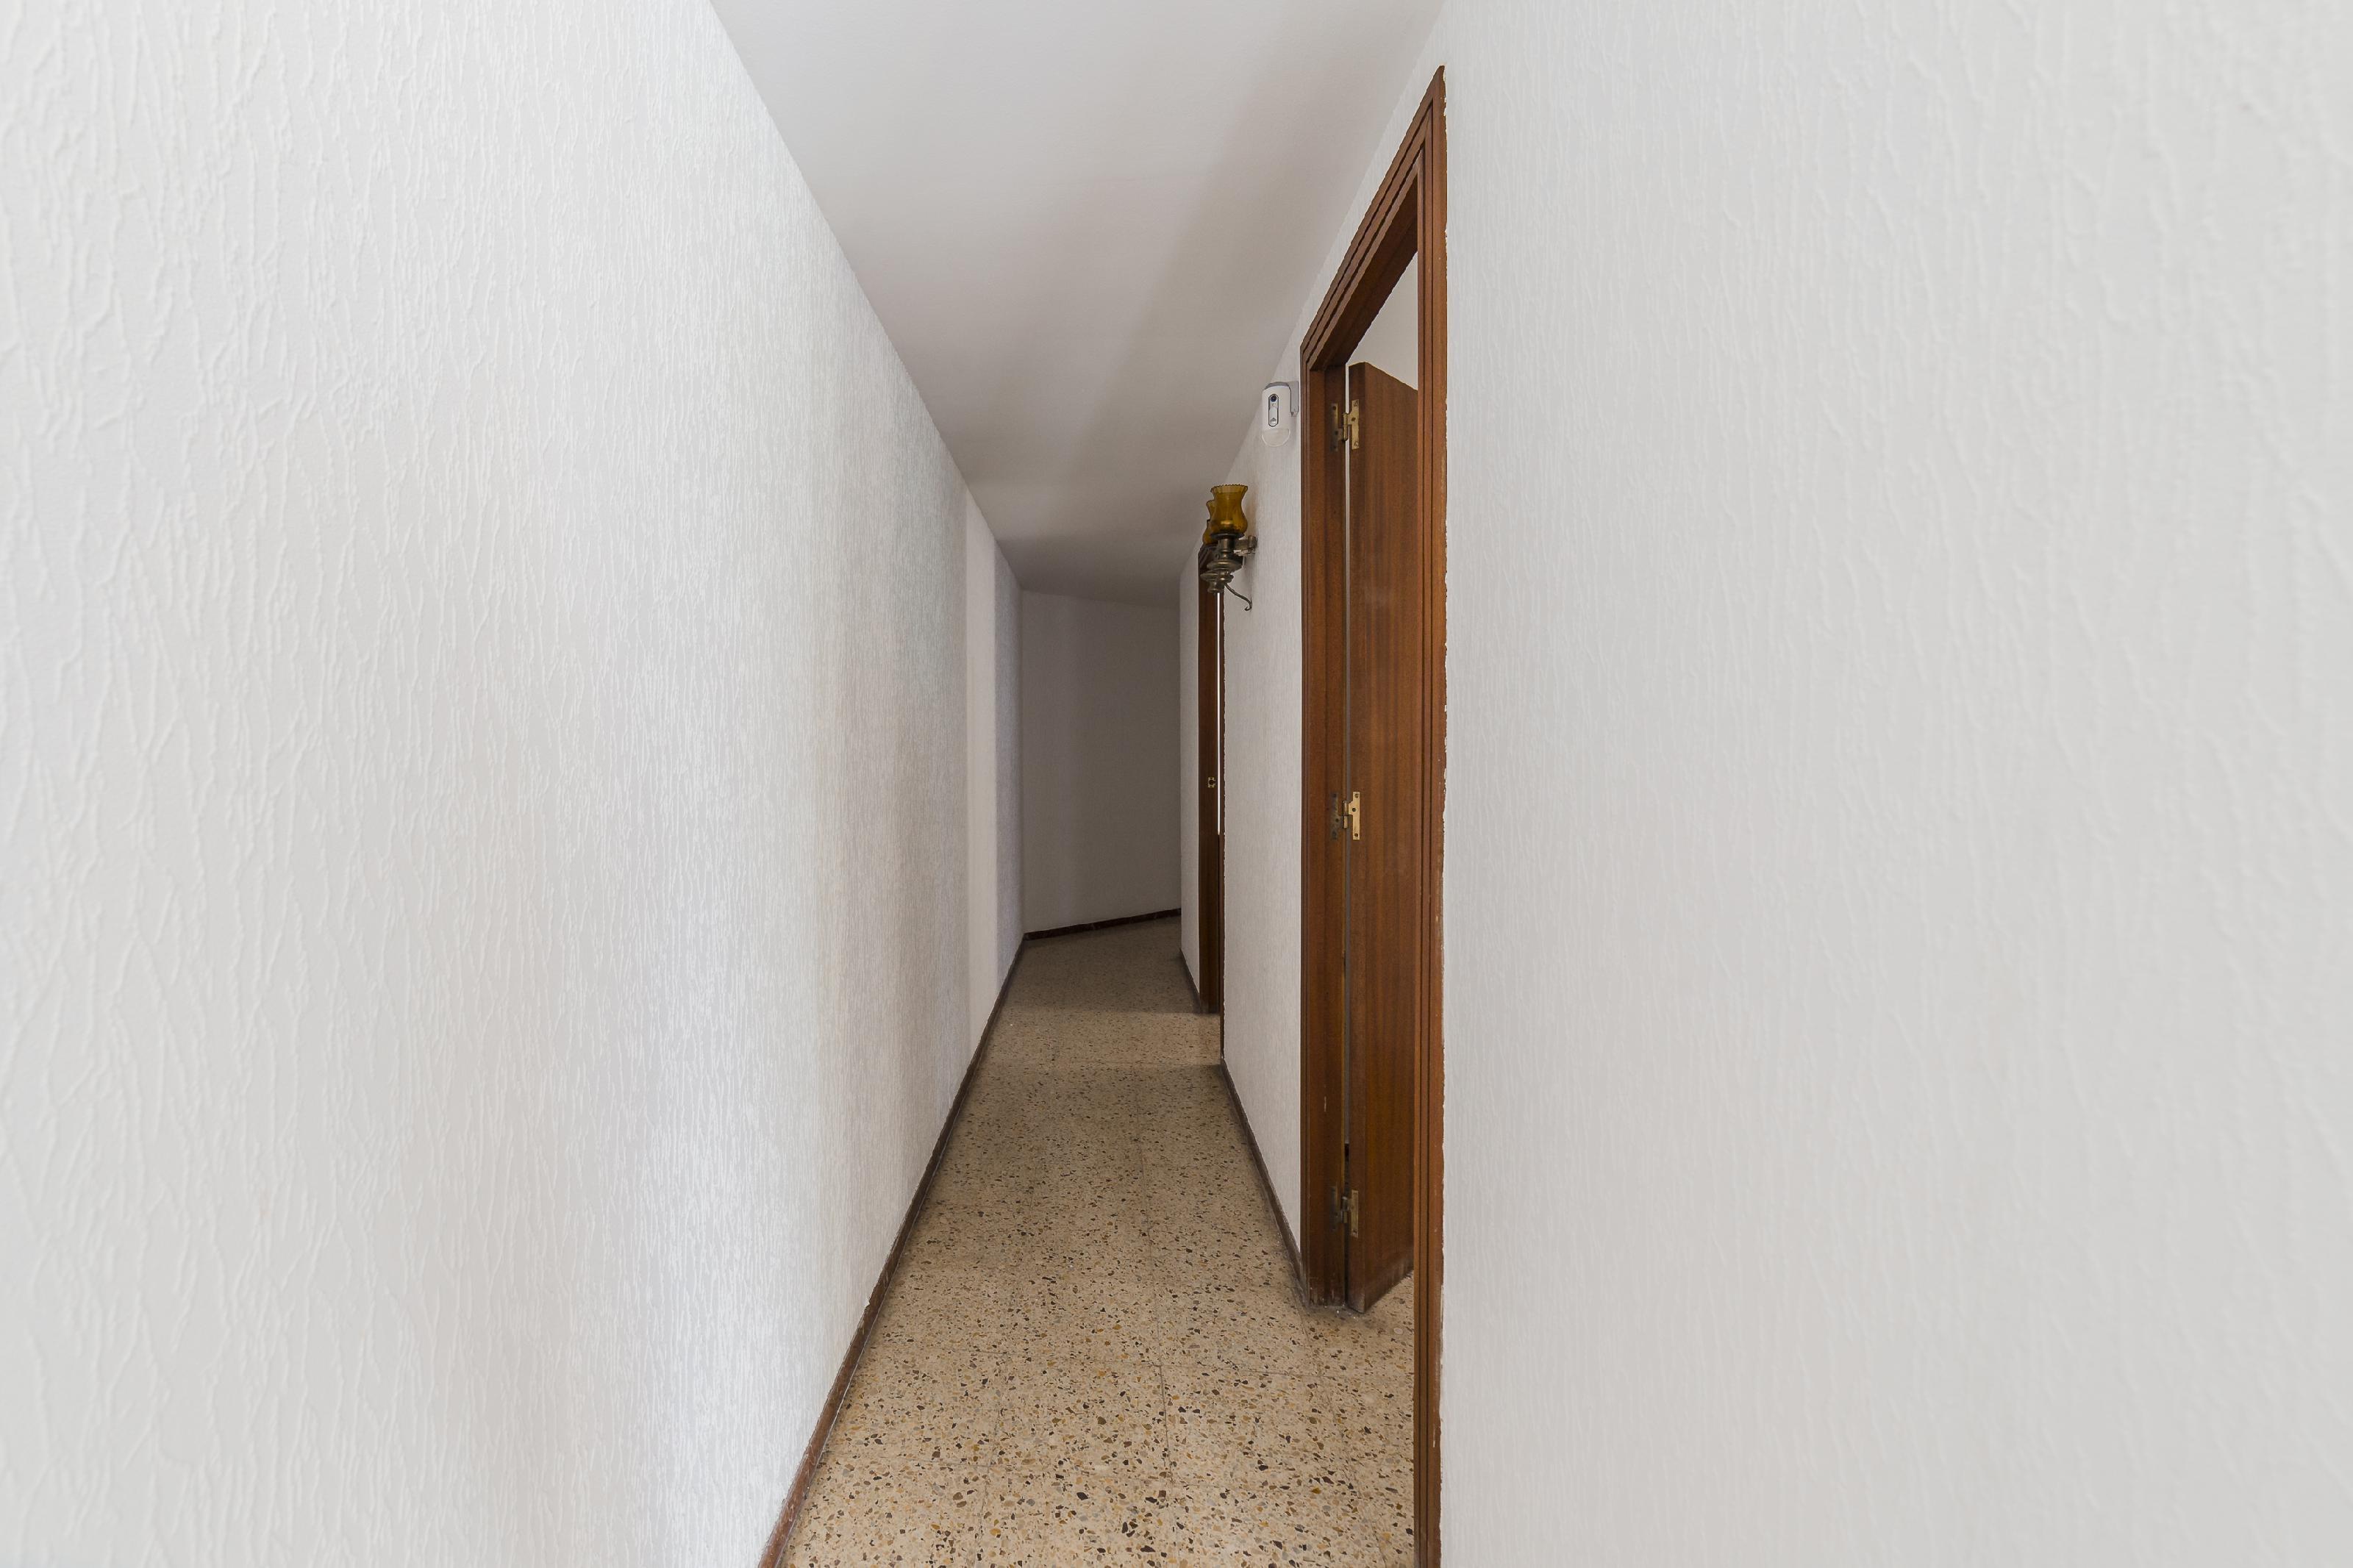 247624 Flat for sale in Eixample, Sant Antoni 14